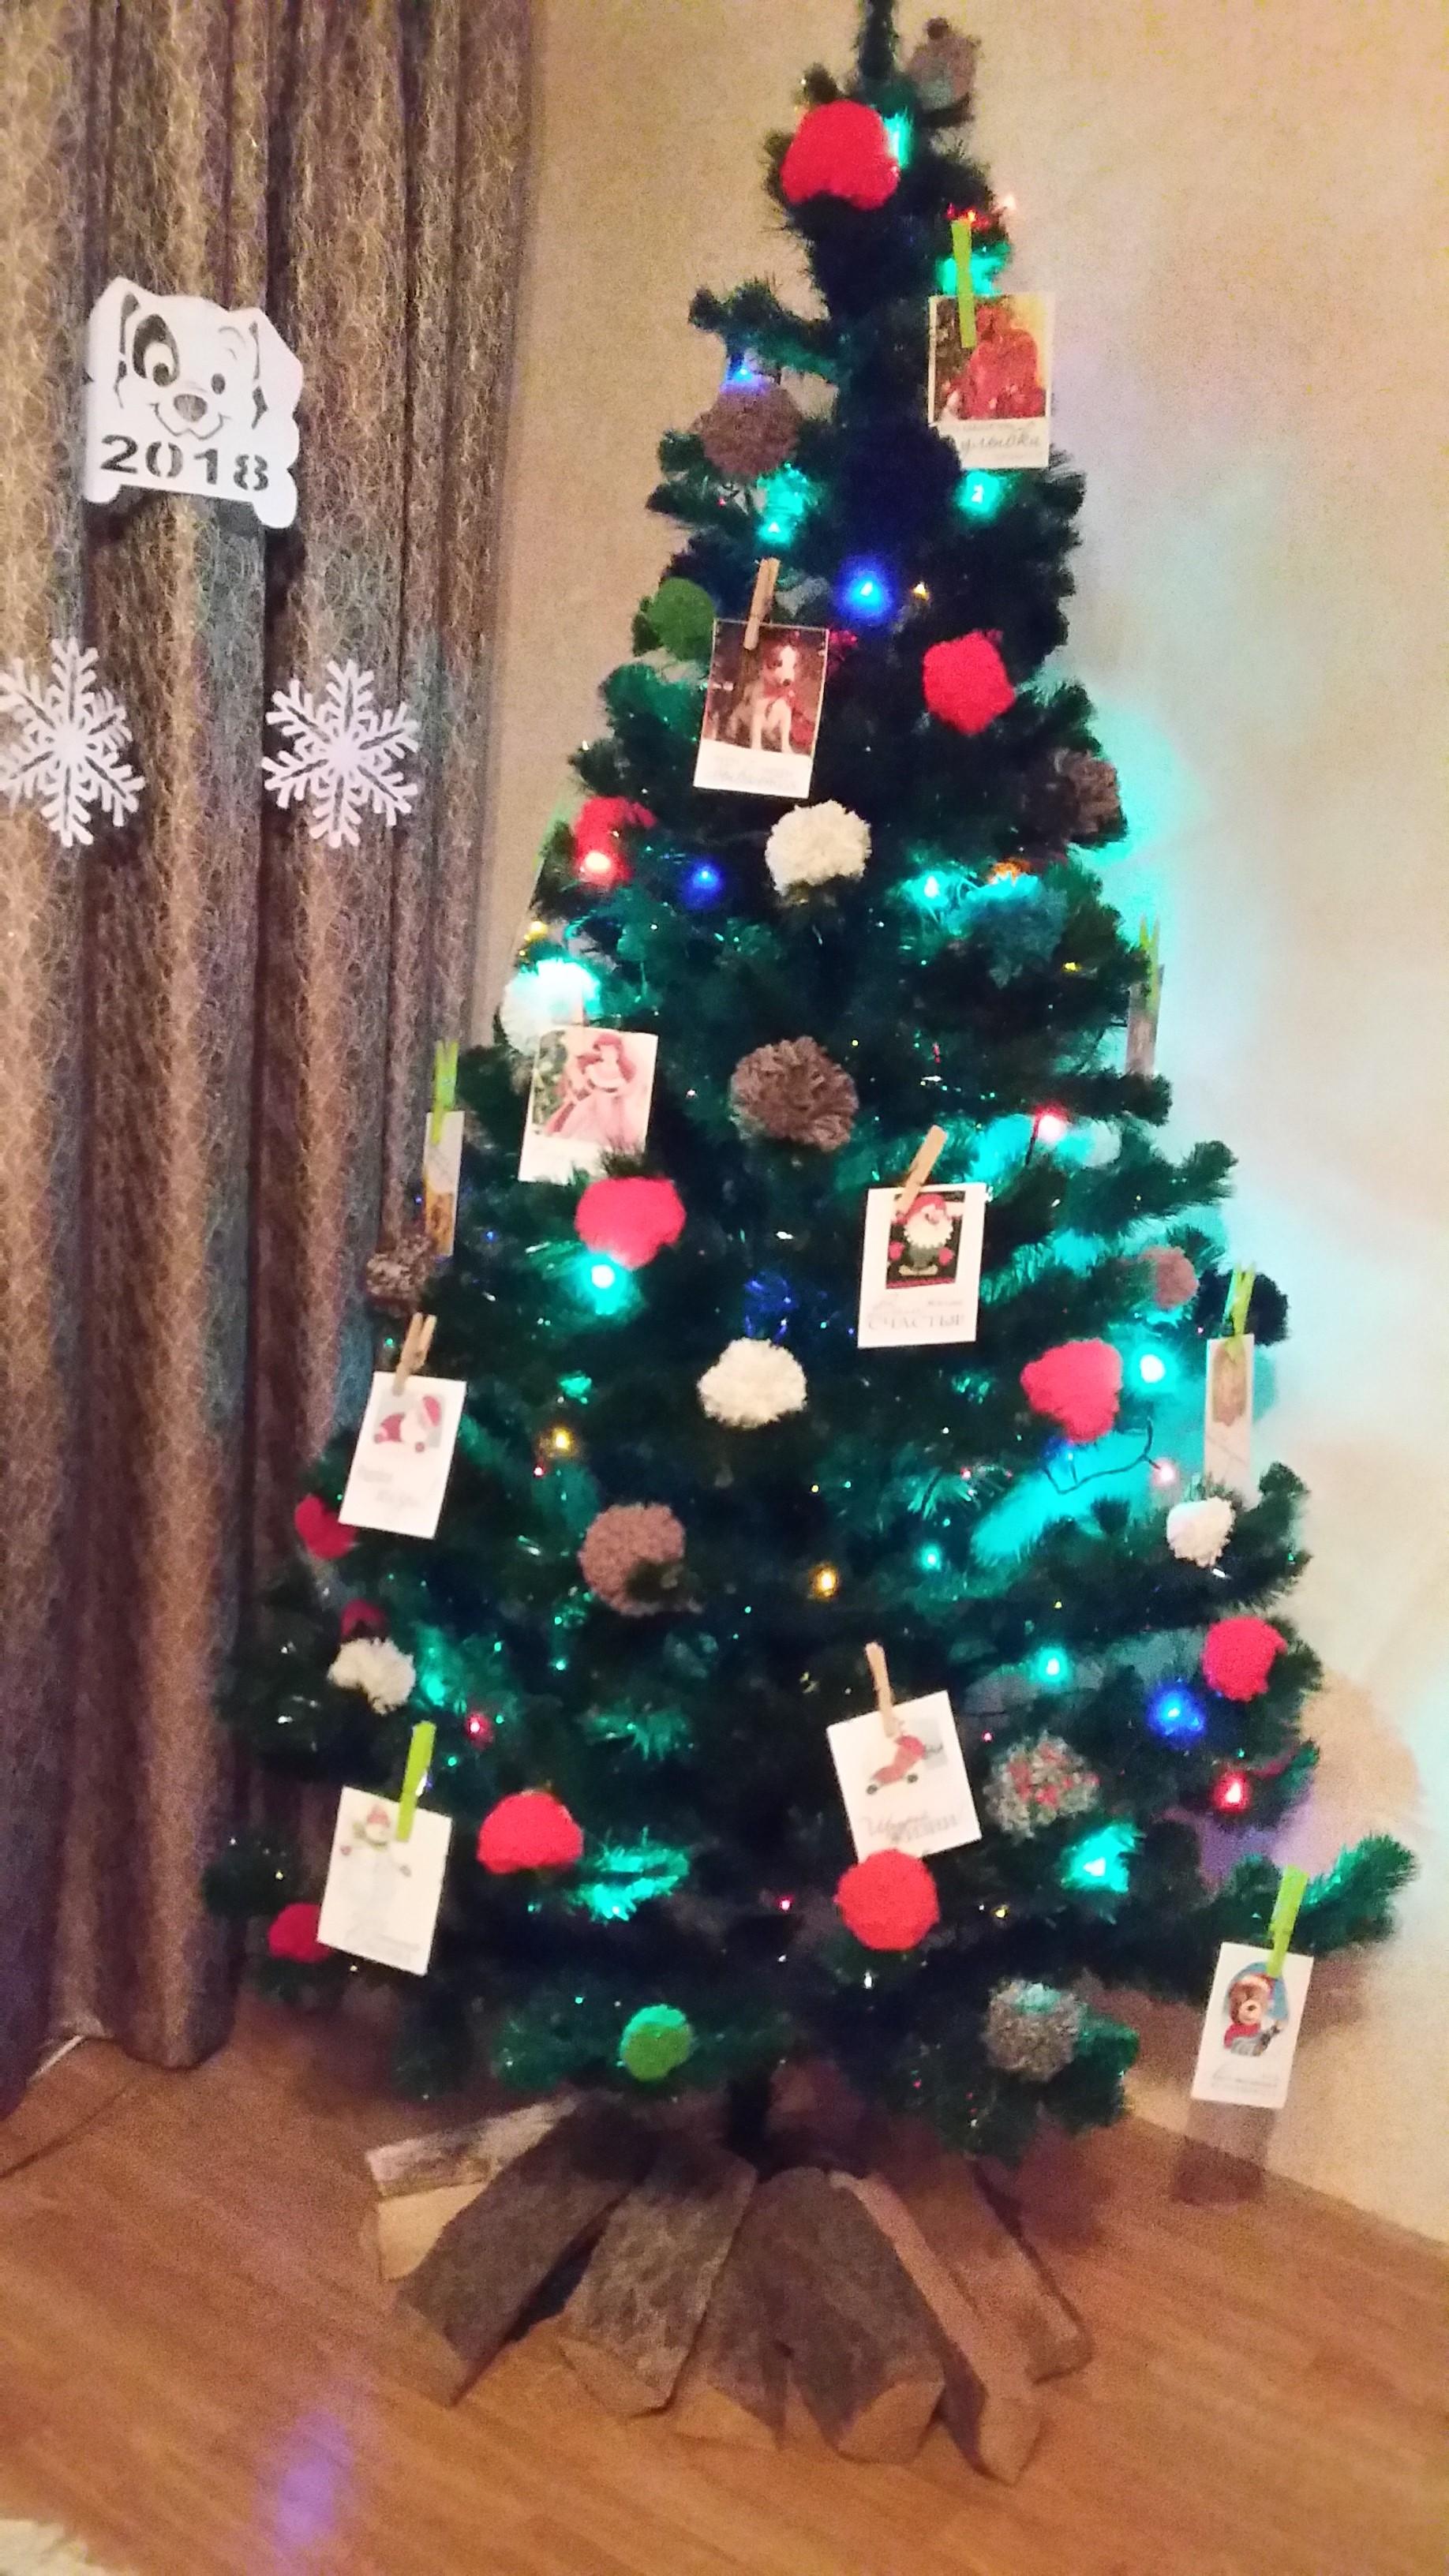 Наша красавица!. Блиц: новогодняя елка